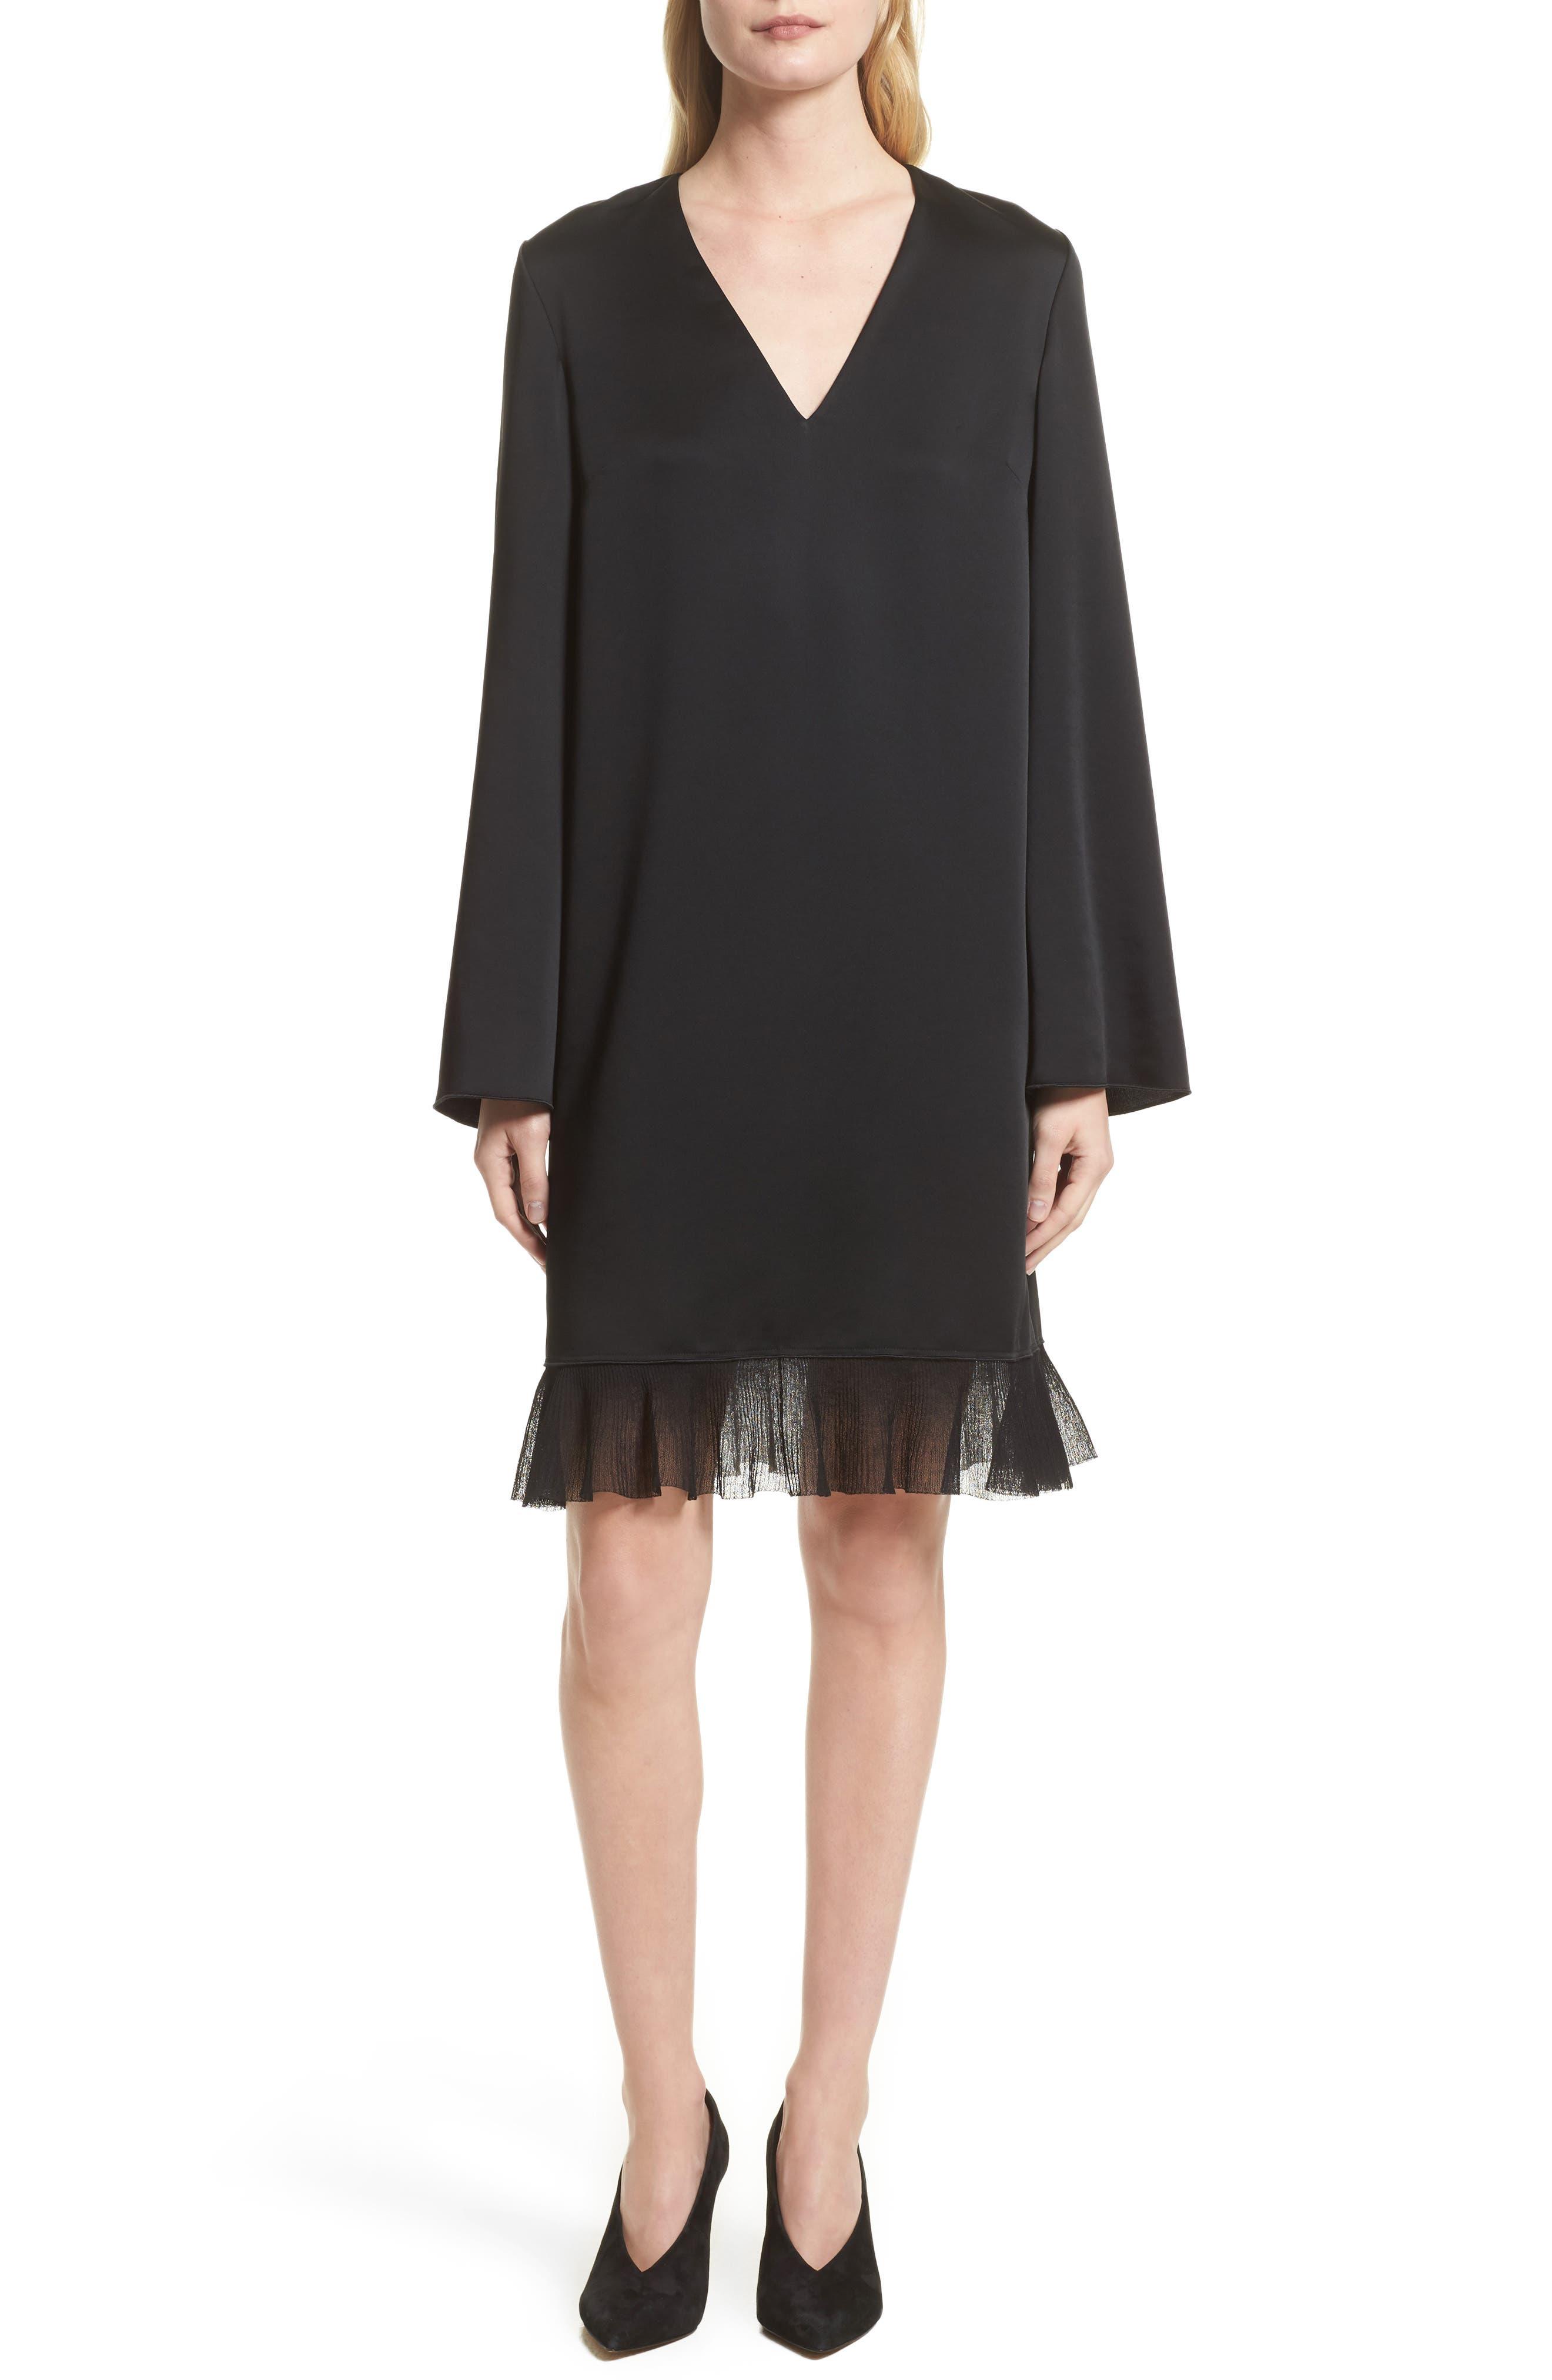 Heath Shift Dress,                         Main,                         color, 001